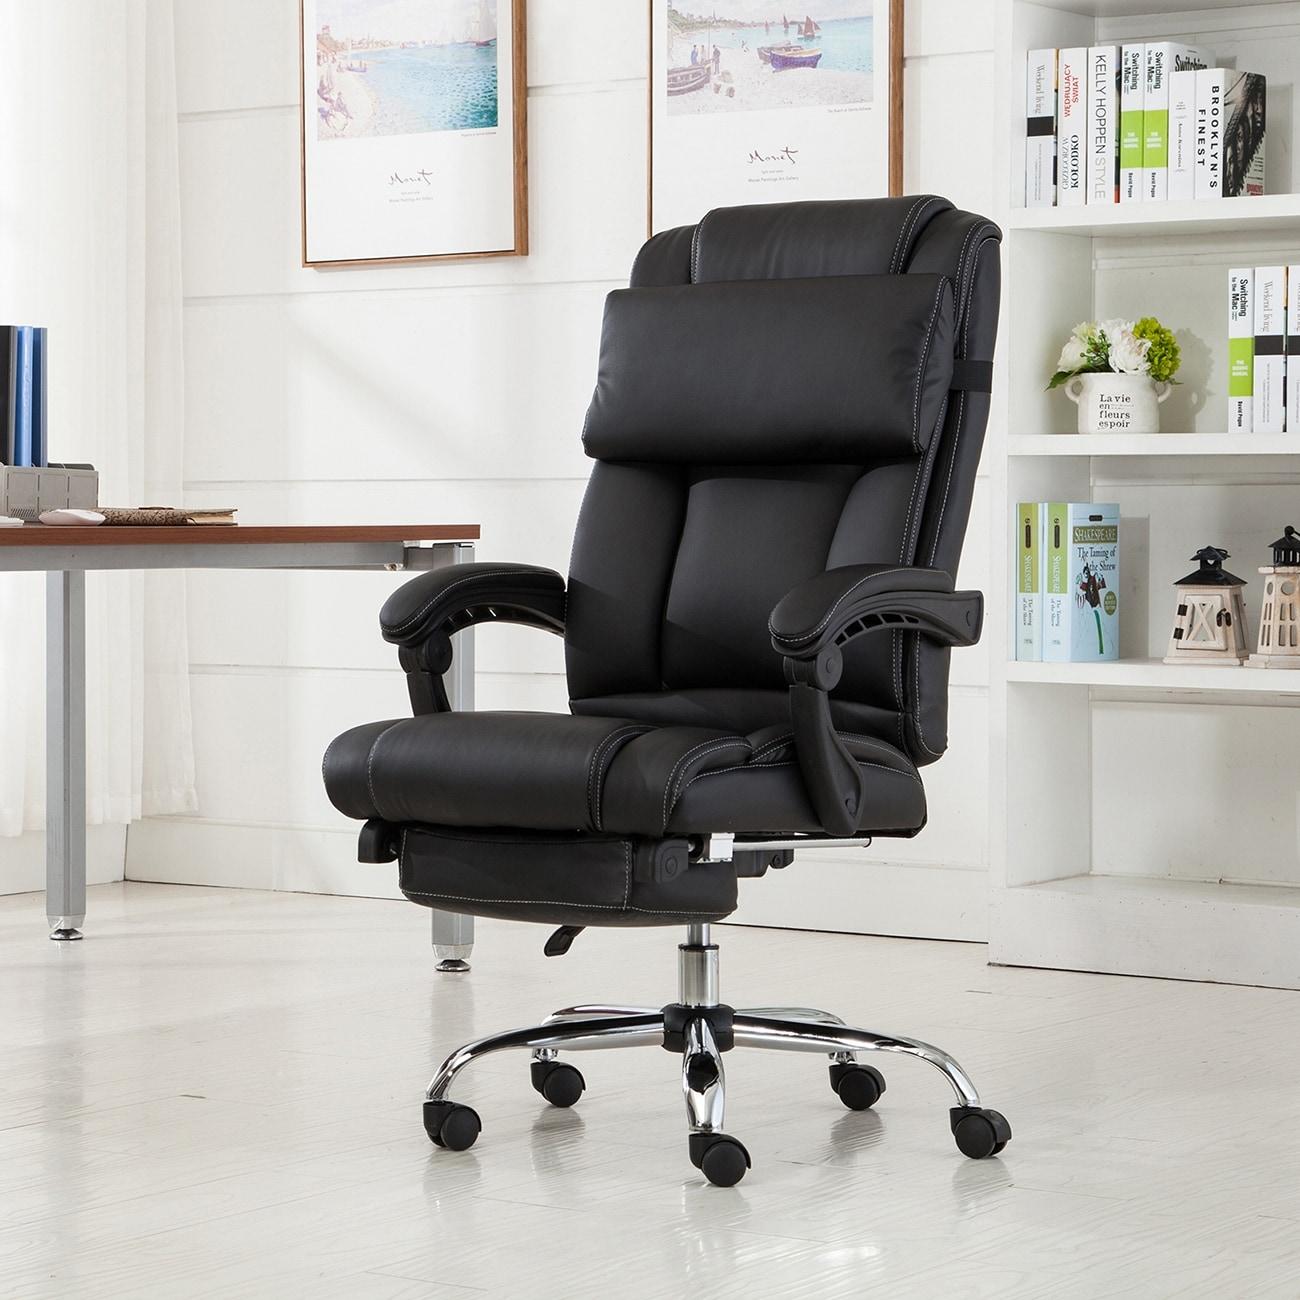 Belleze Executive Reclining Office Chair High Back PU Leather Footrest  Armchair Recline w/ Pillow -Black